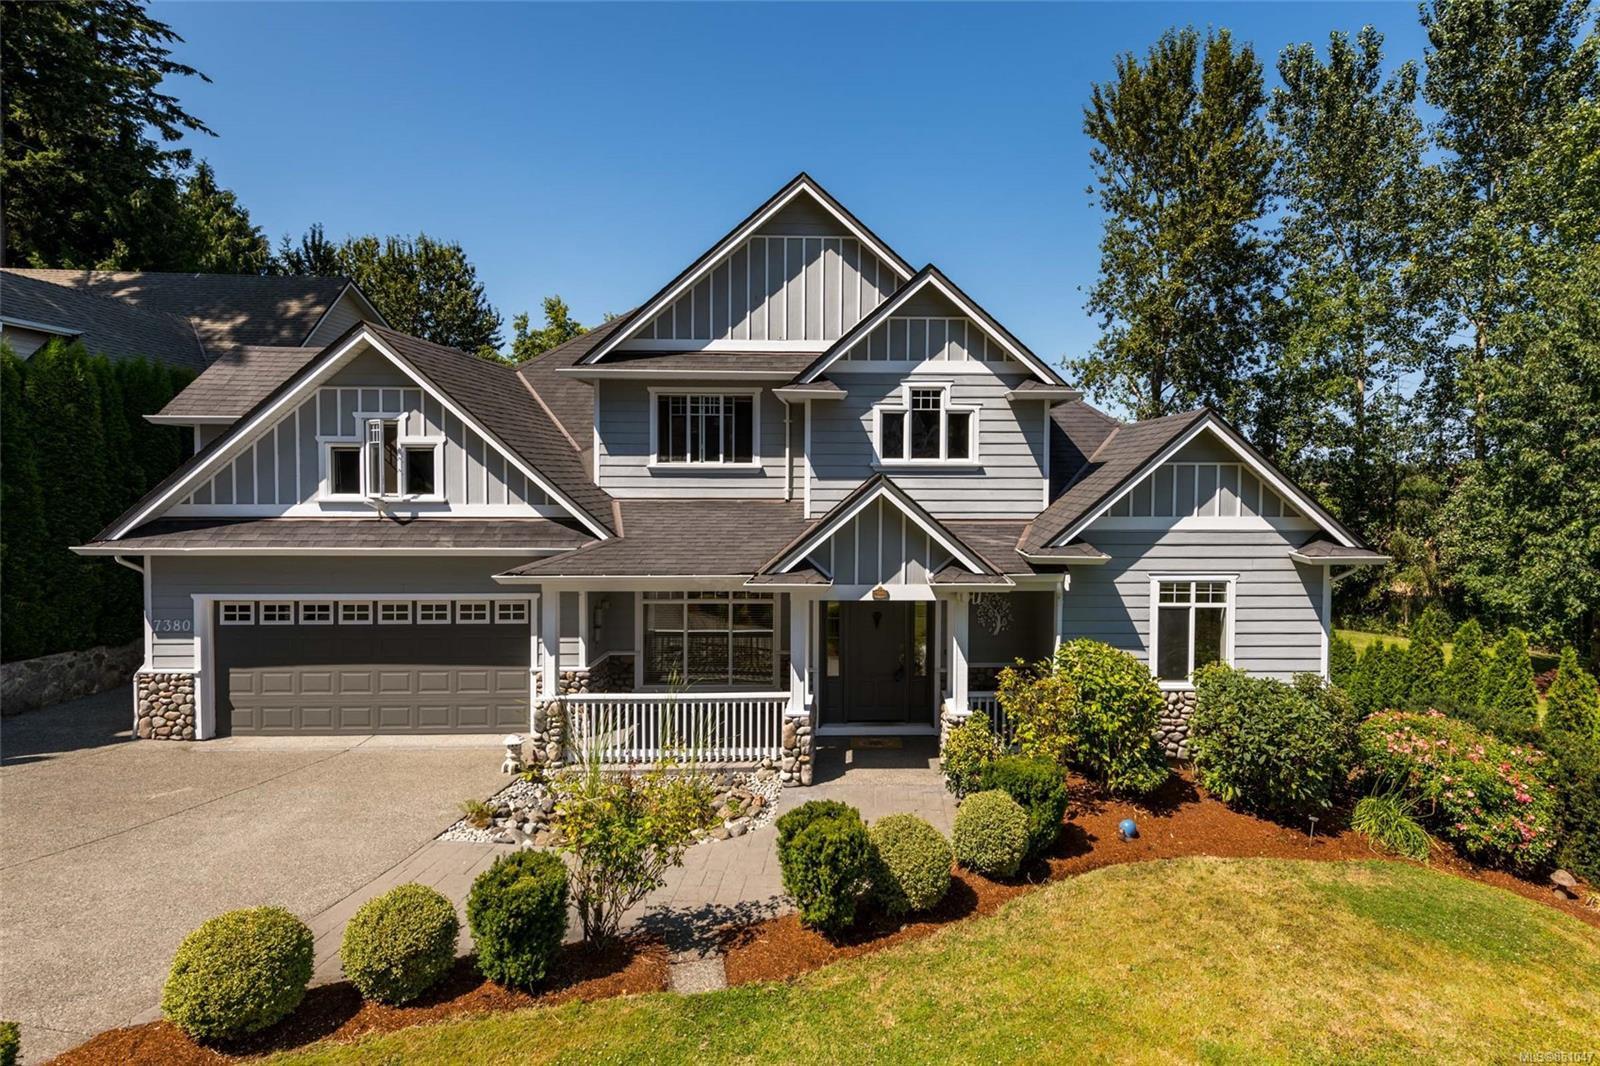 Main Photo: 7380 Ridgedown Crt in : CS Saanichton Single Family Detached for sale (Central Saanich)  : MLS®# 851047